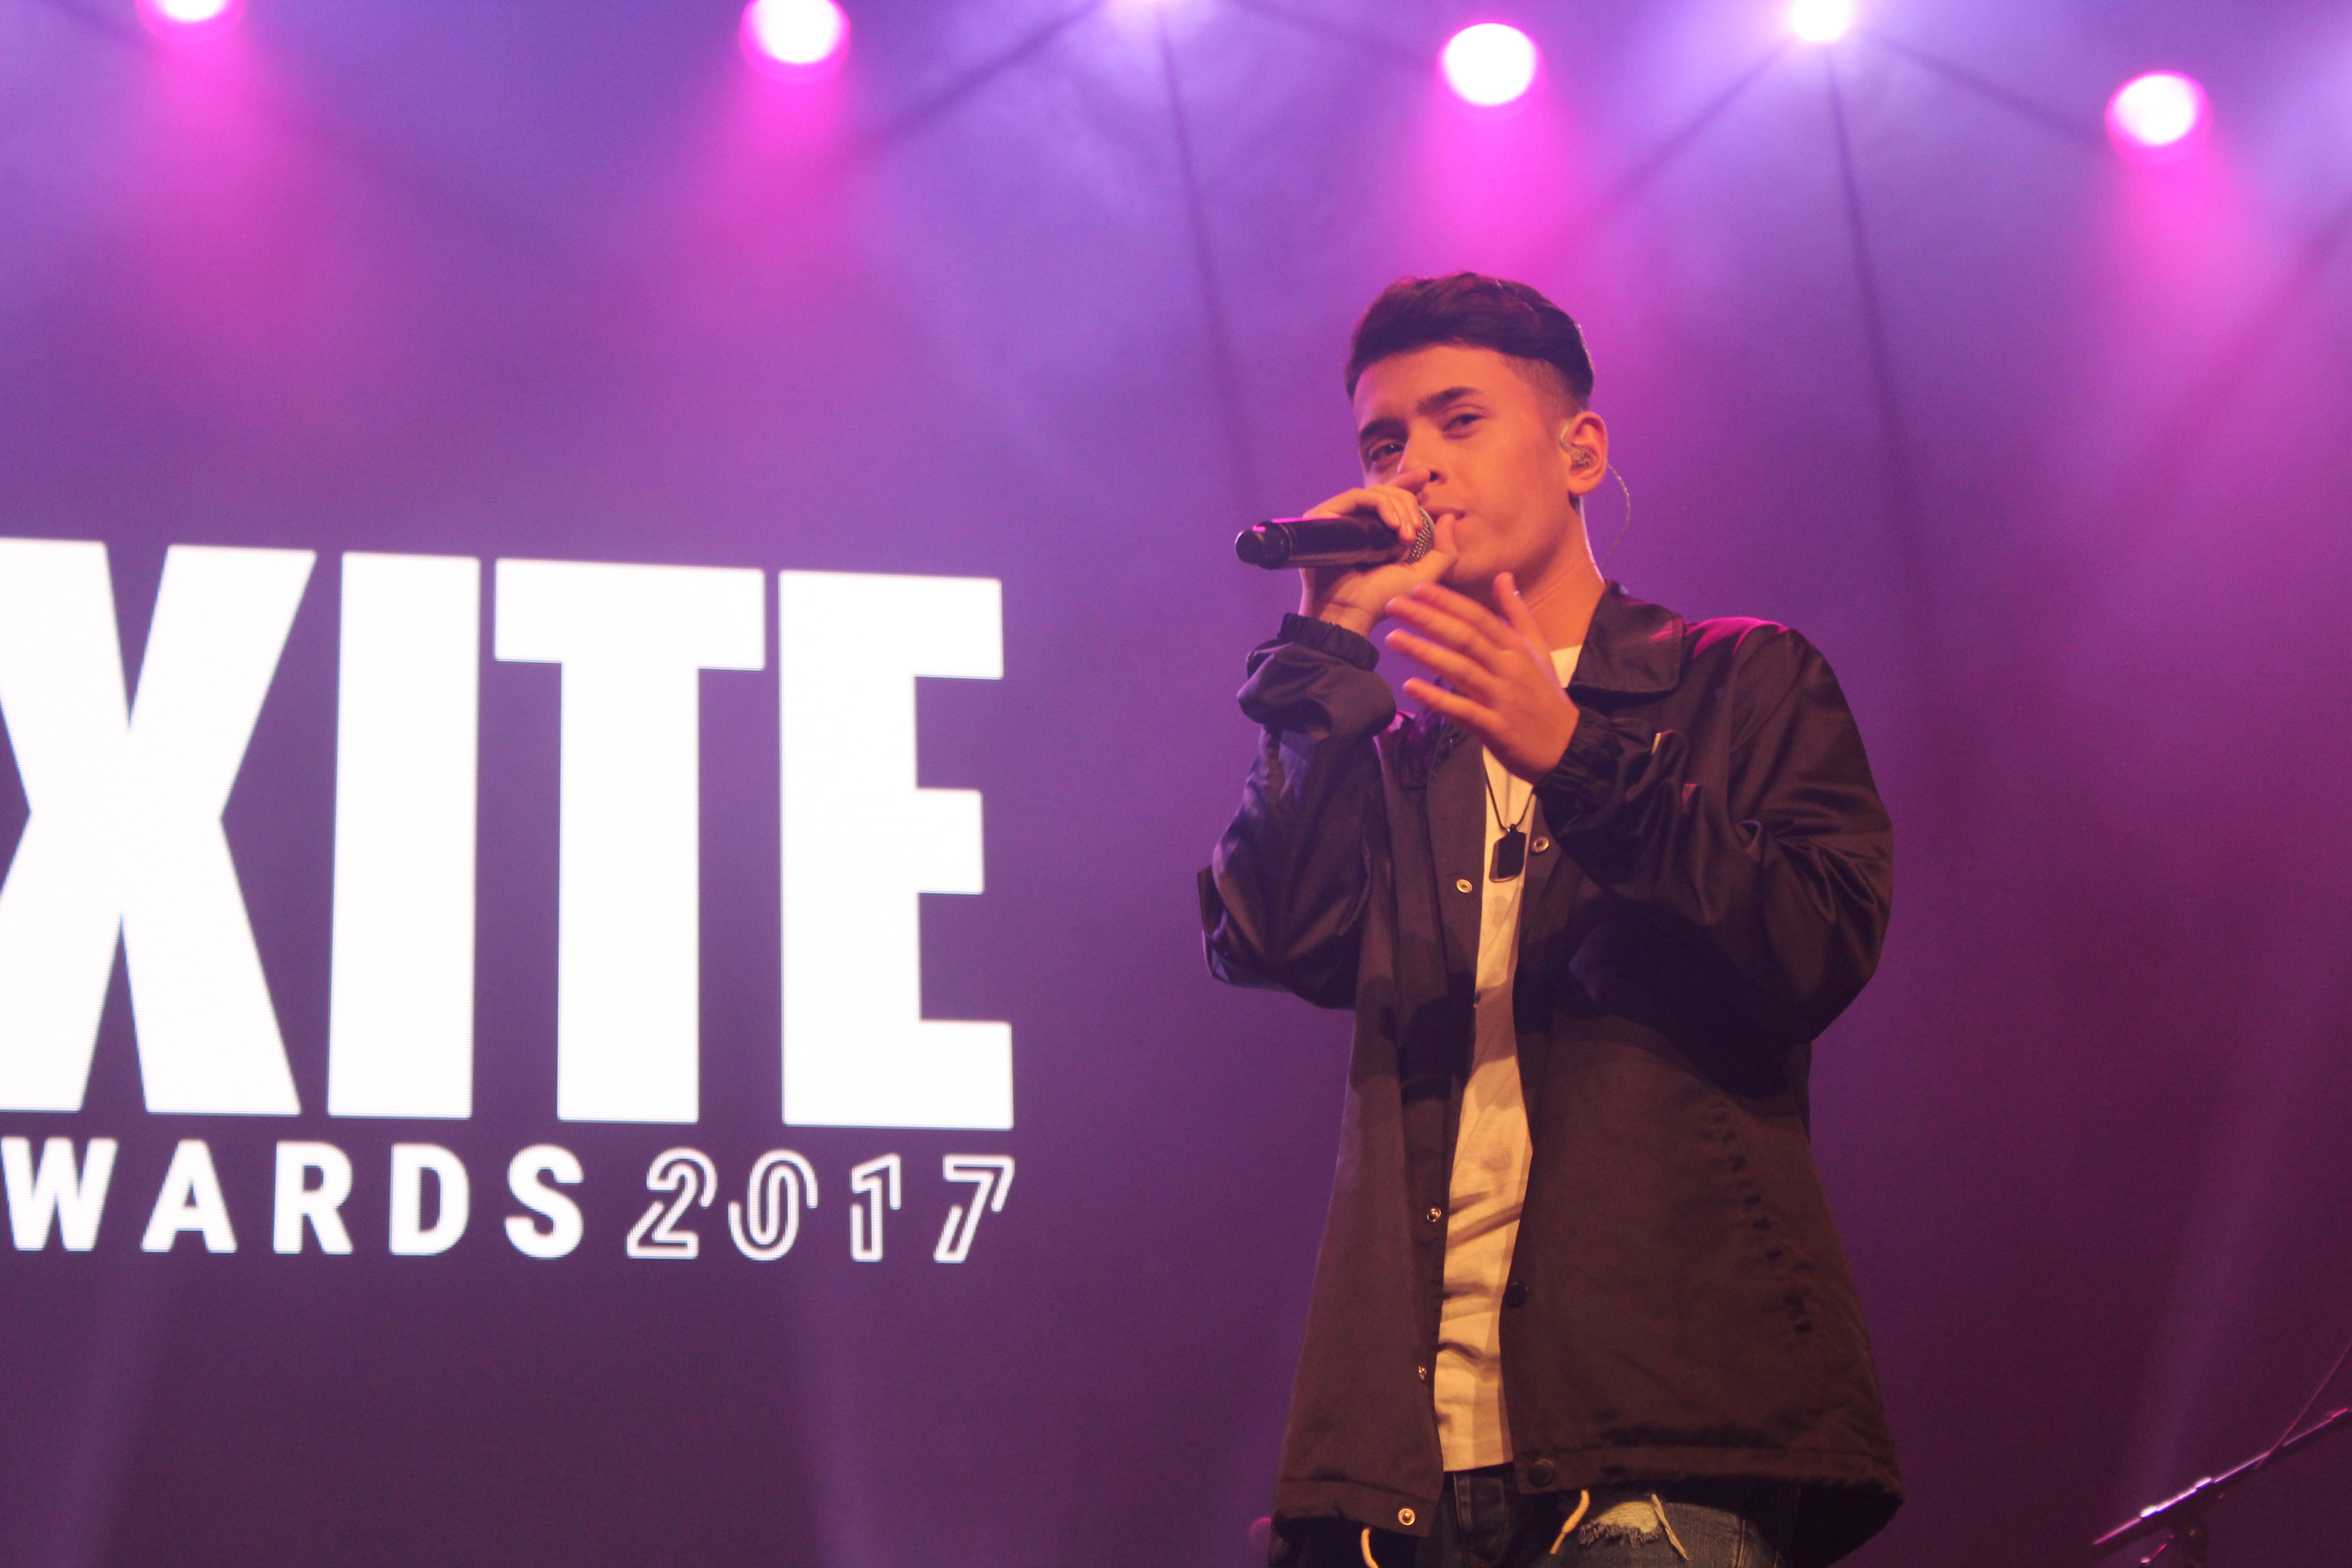 Vincenzo @ XITE Awards - Fotocredits: Chenneti Ascencion (Artiestennieuws)